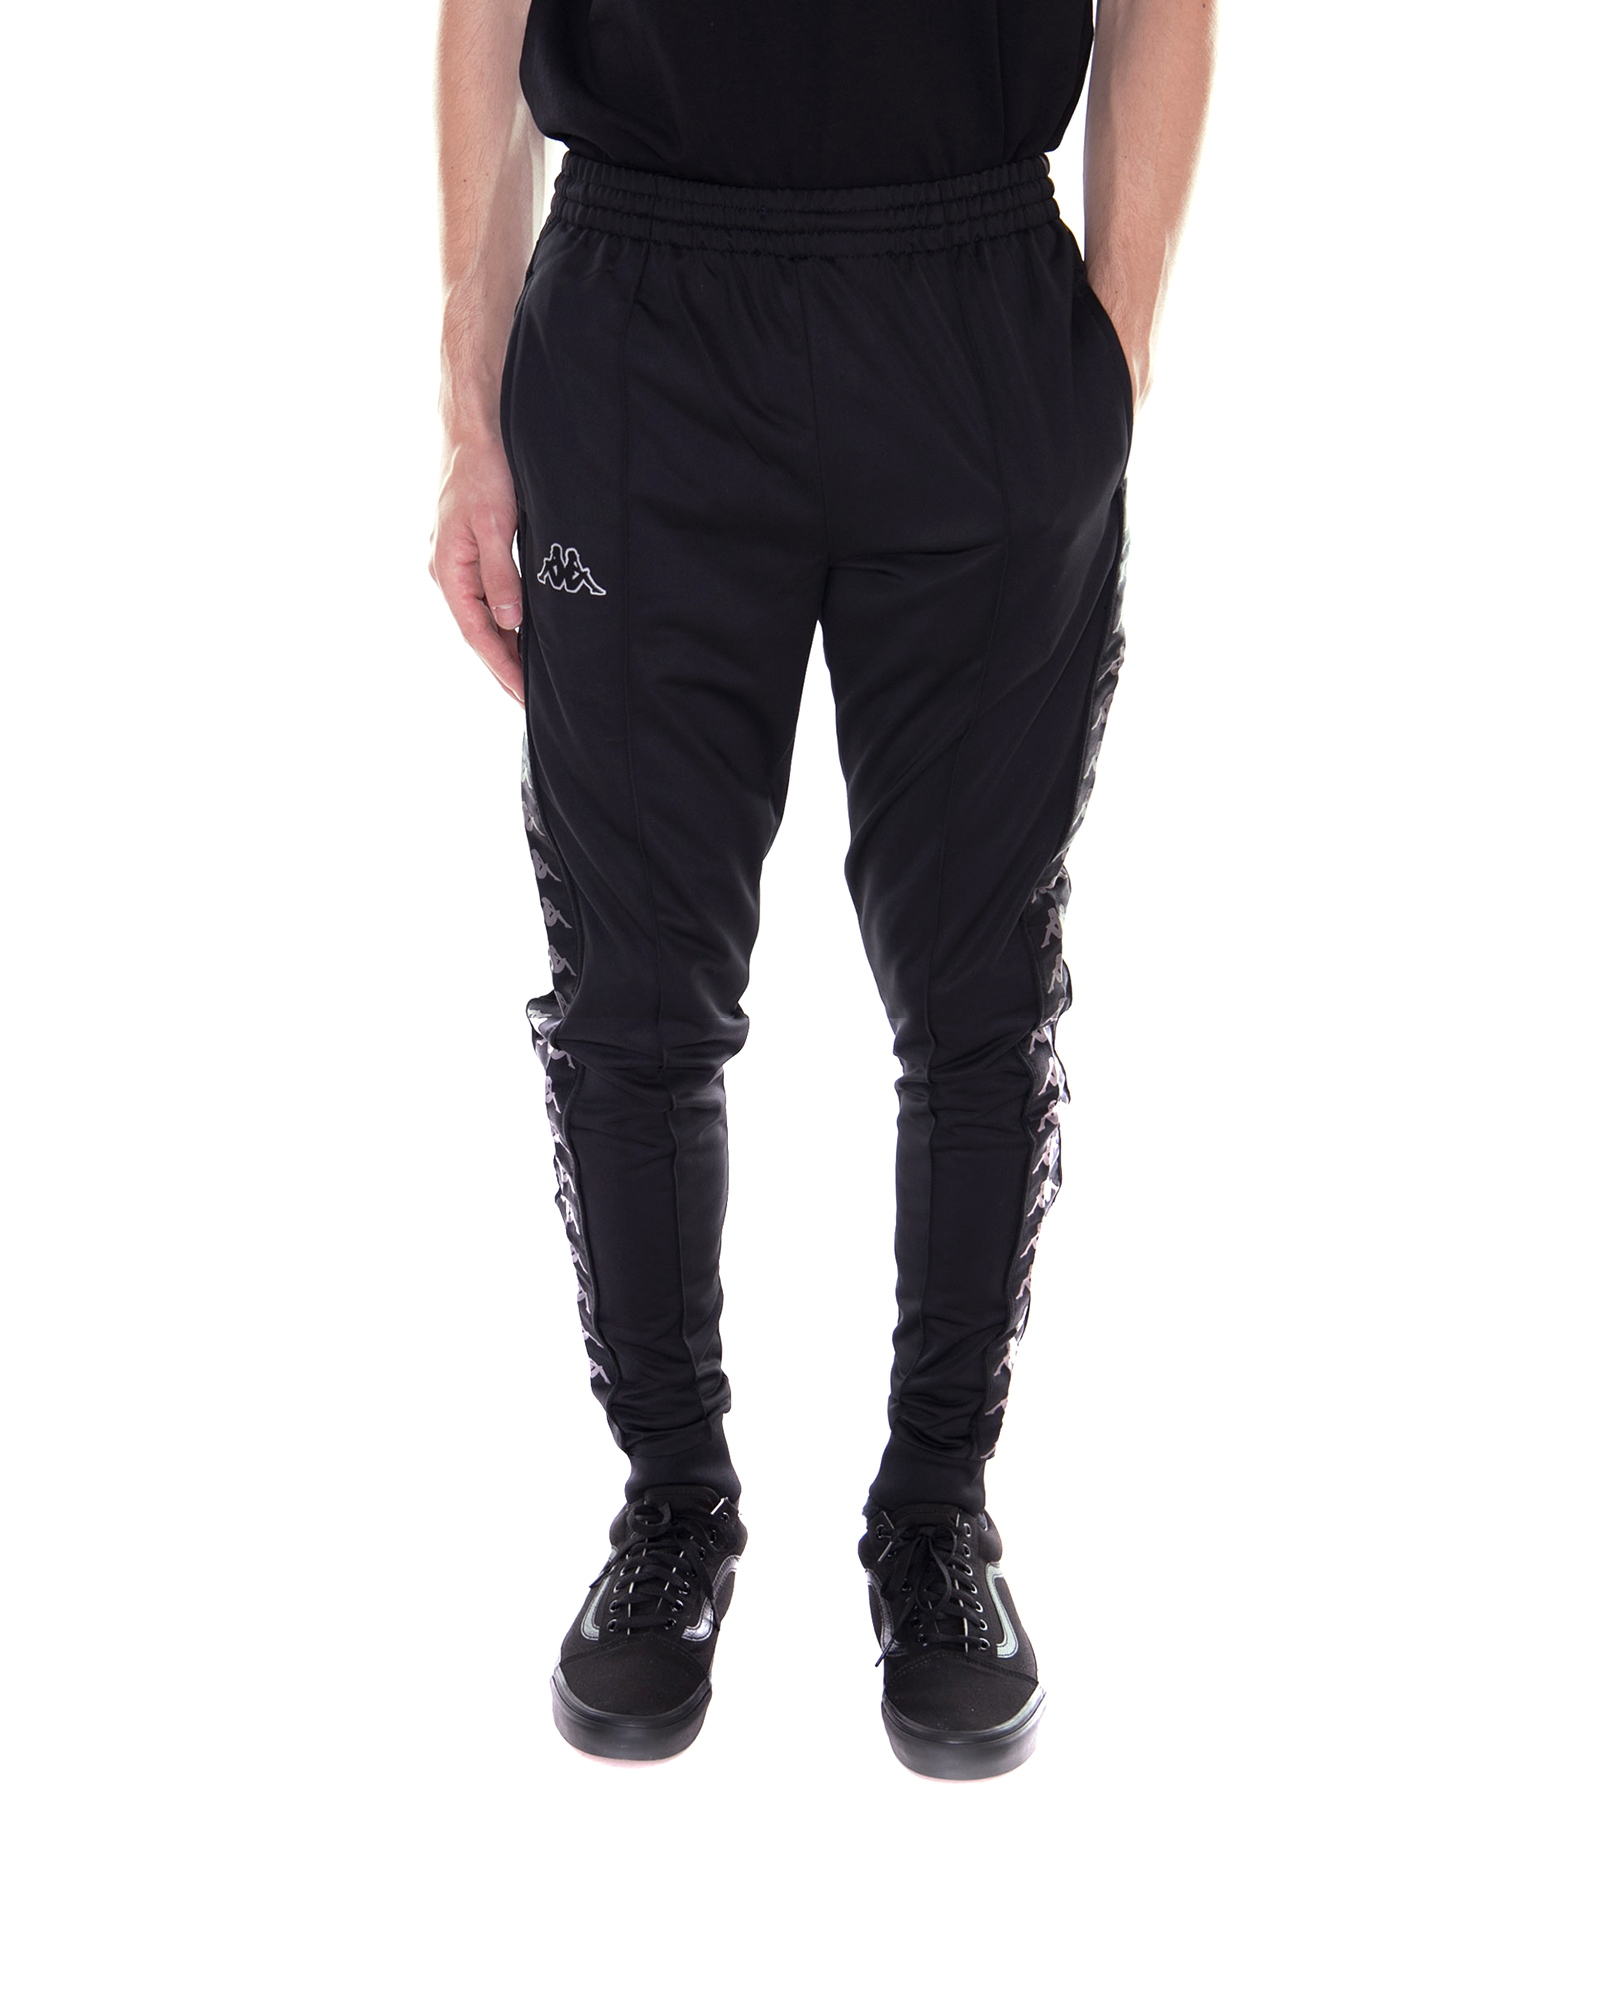 Kappa Band 222 Ebay Slim Black Rastoria Trousers Blackgrey rxaqCwrv